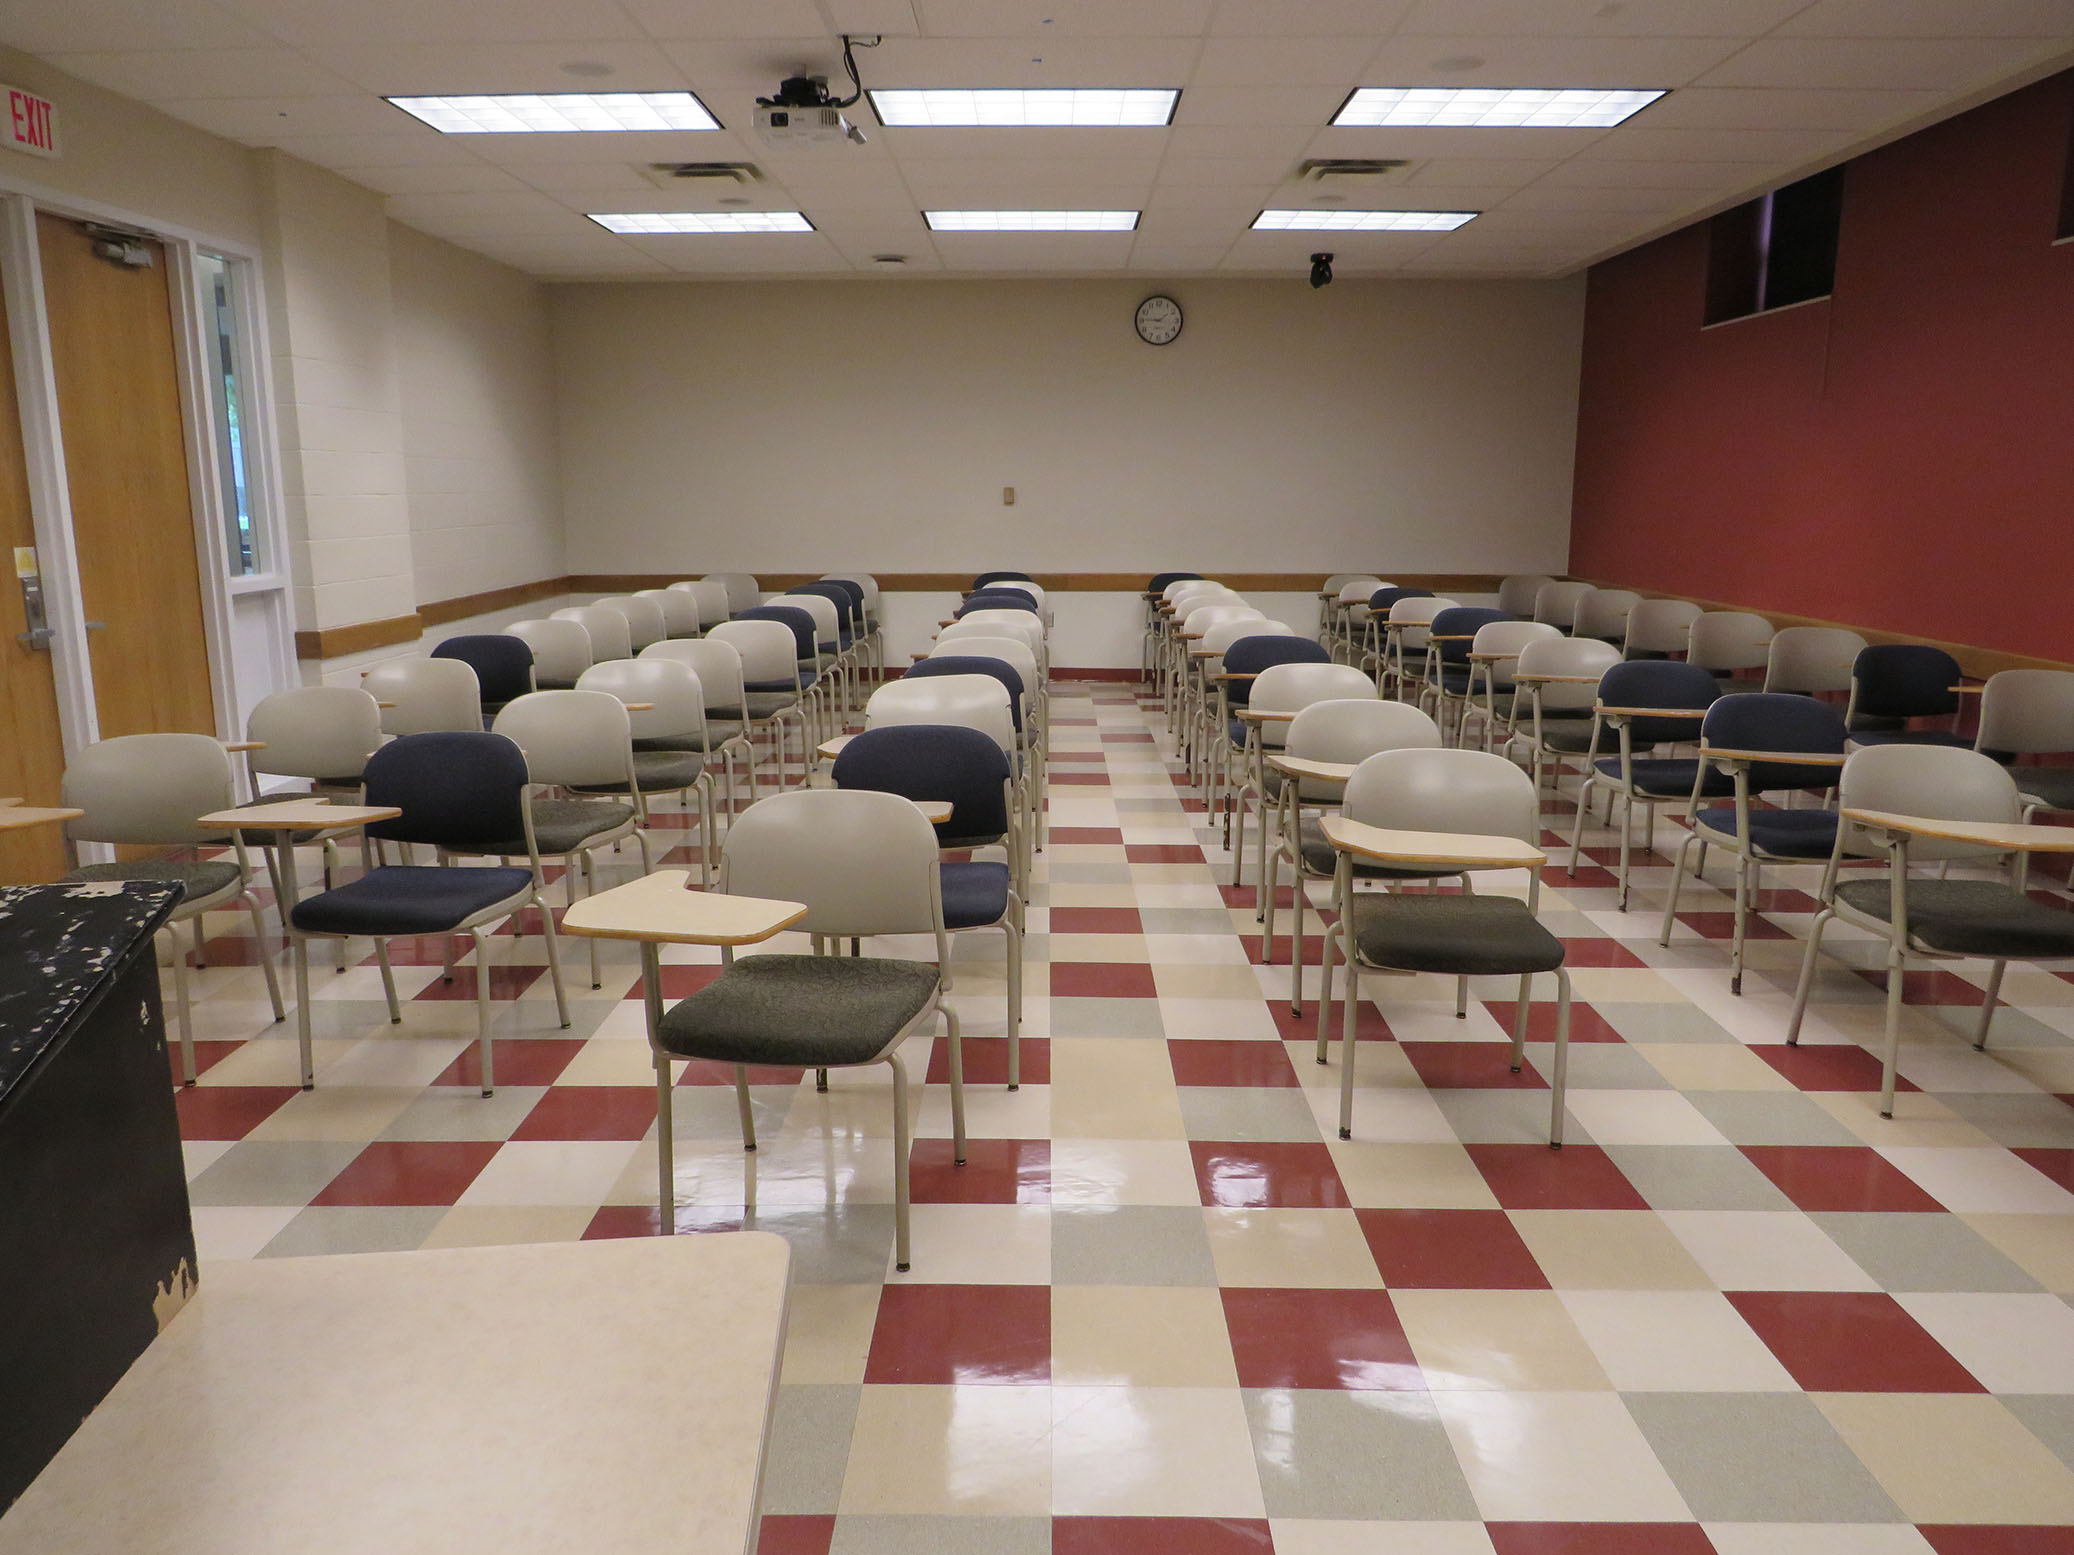 Lazenby Hall Room 002